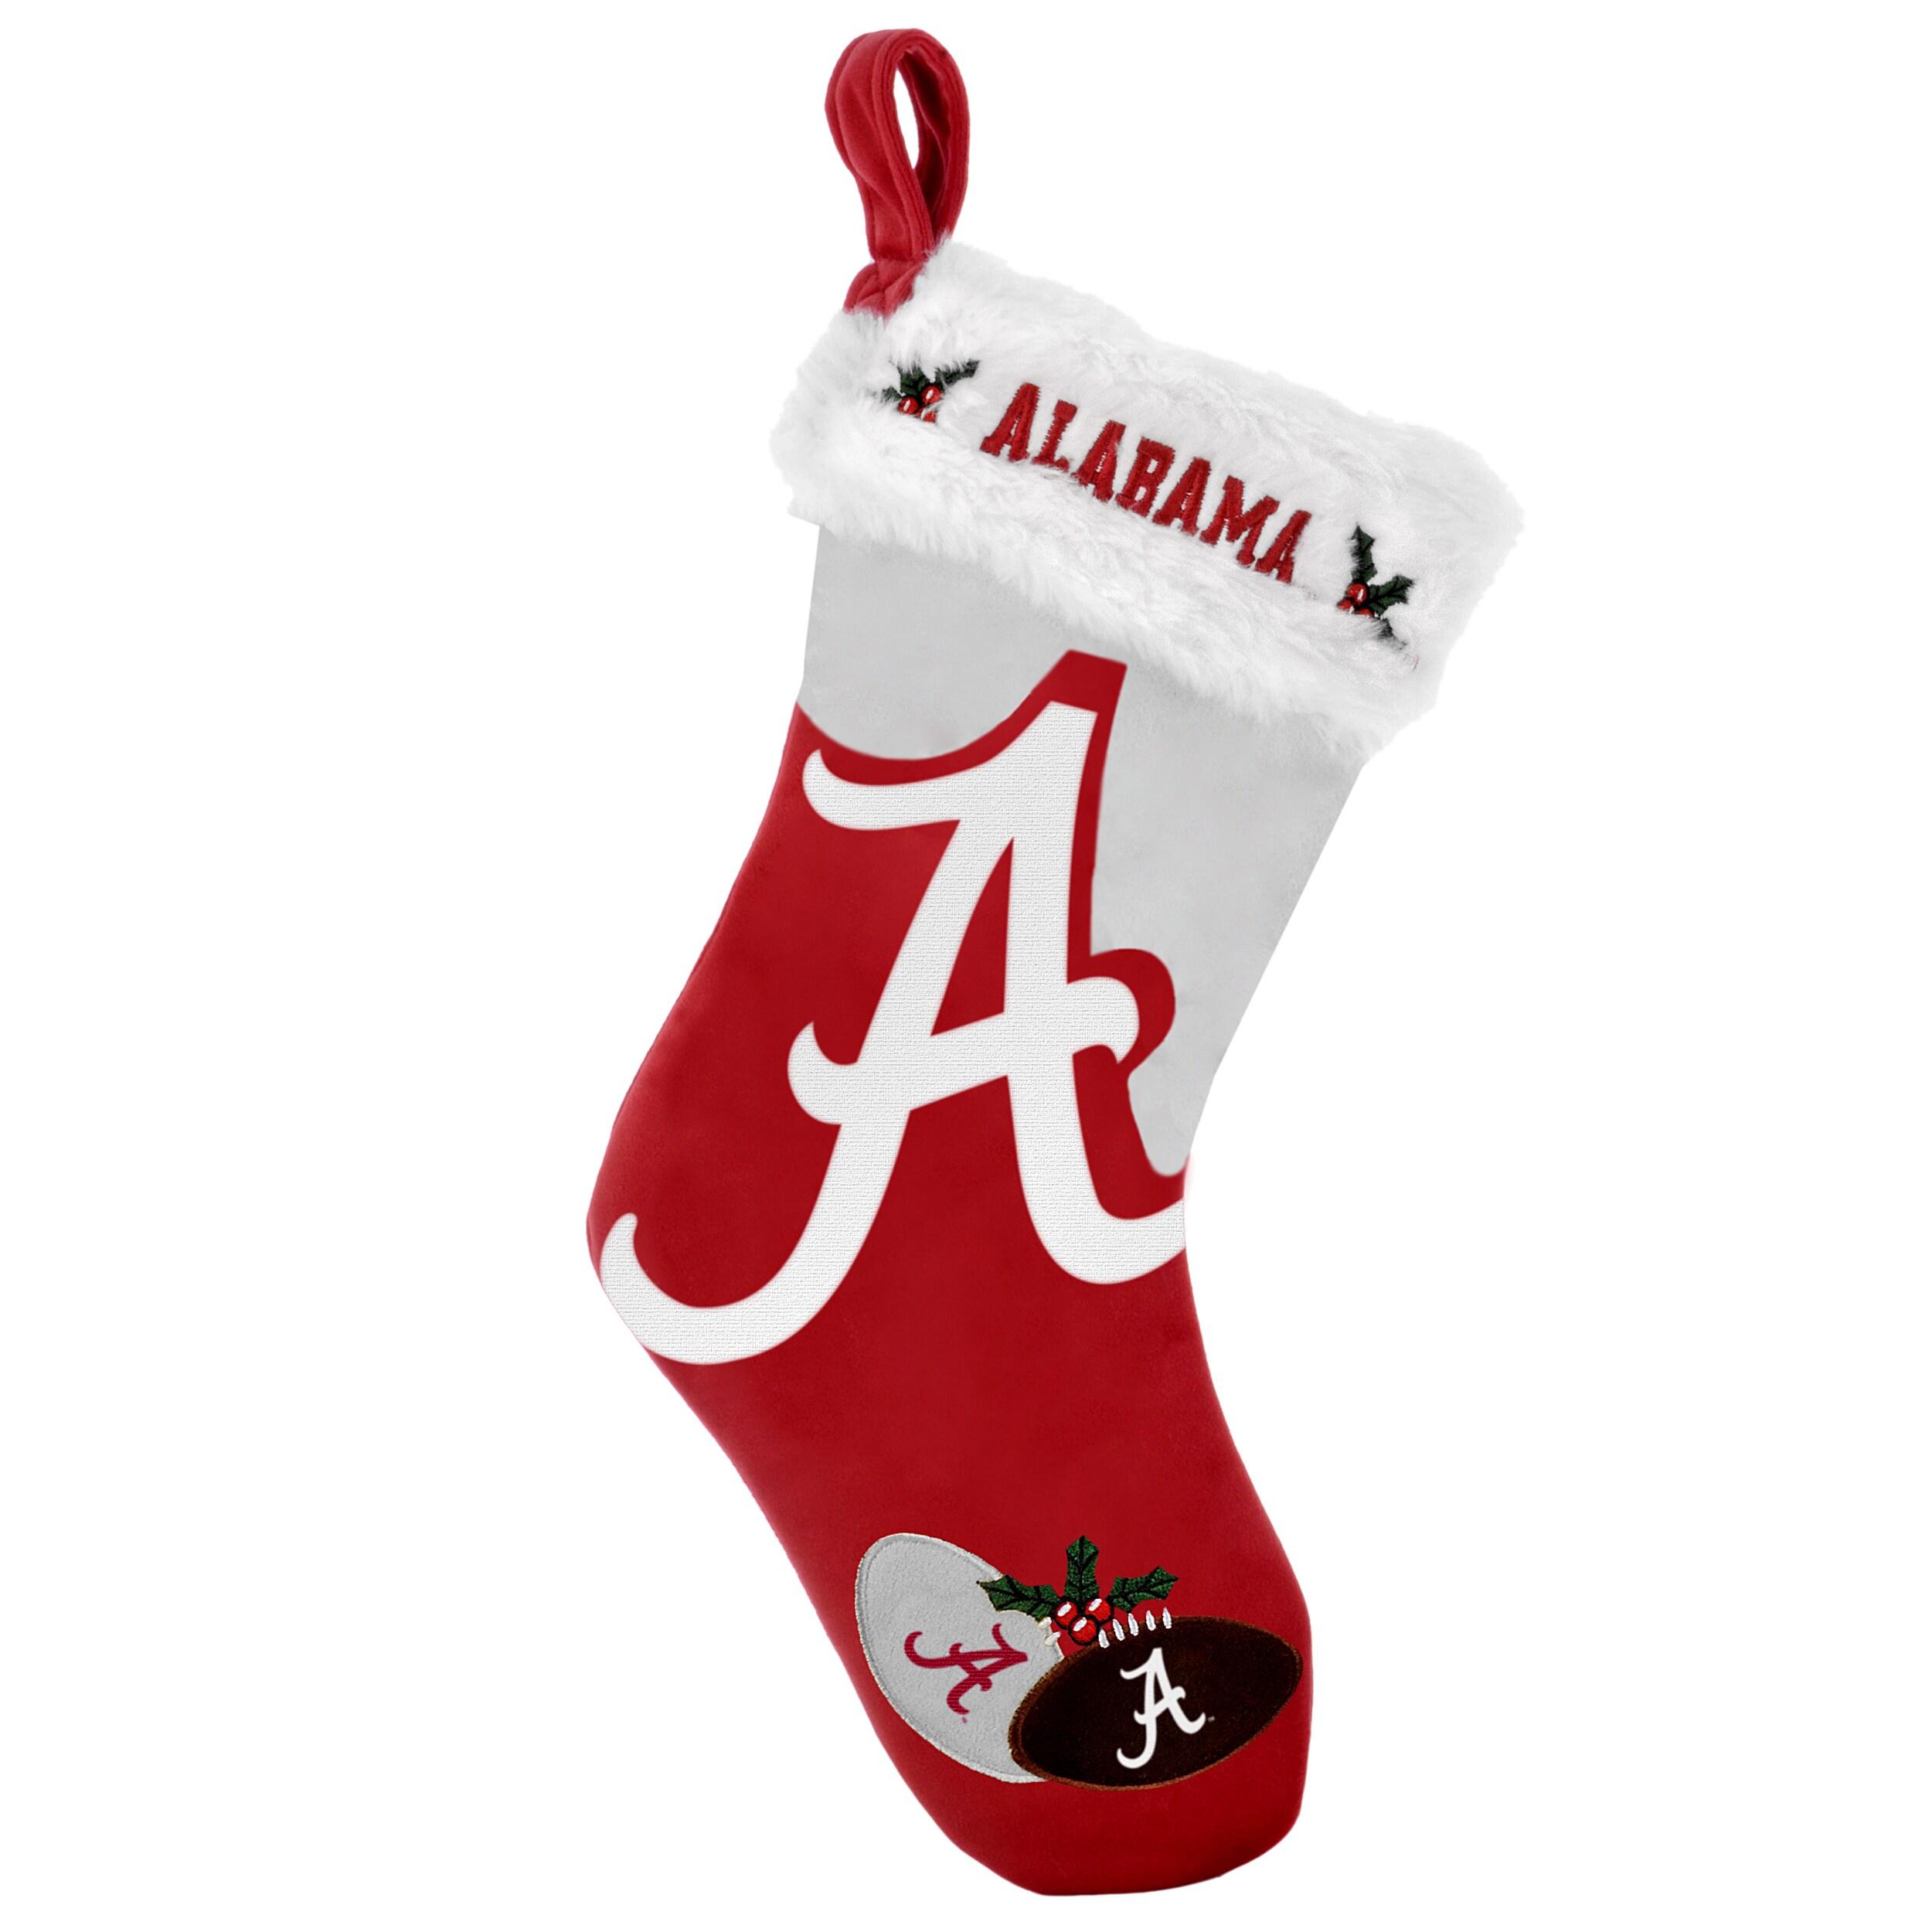 Alabama Crimson Tide 2011 Colorblock Christmas Stocking